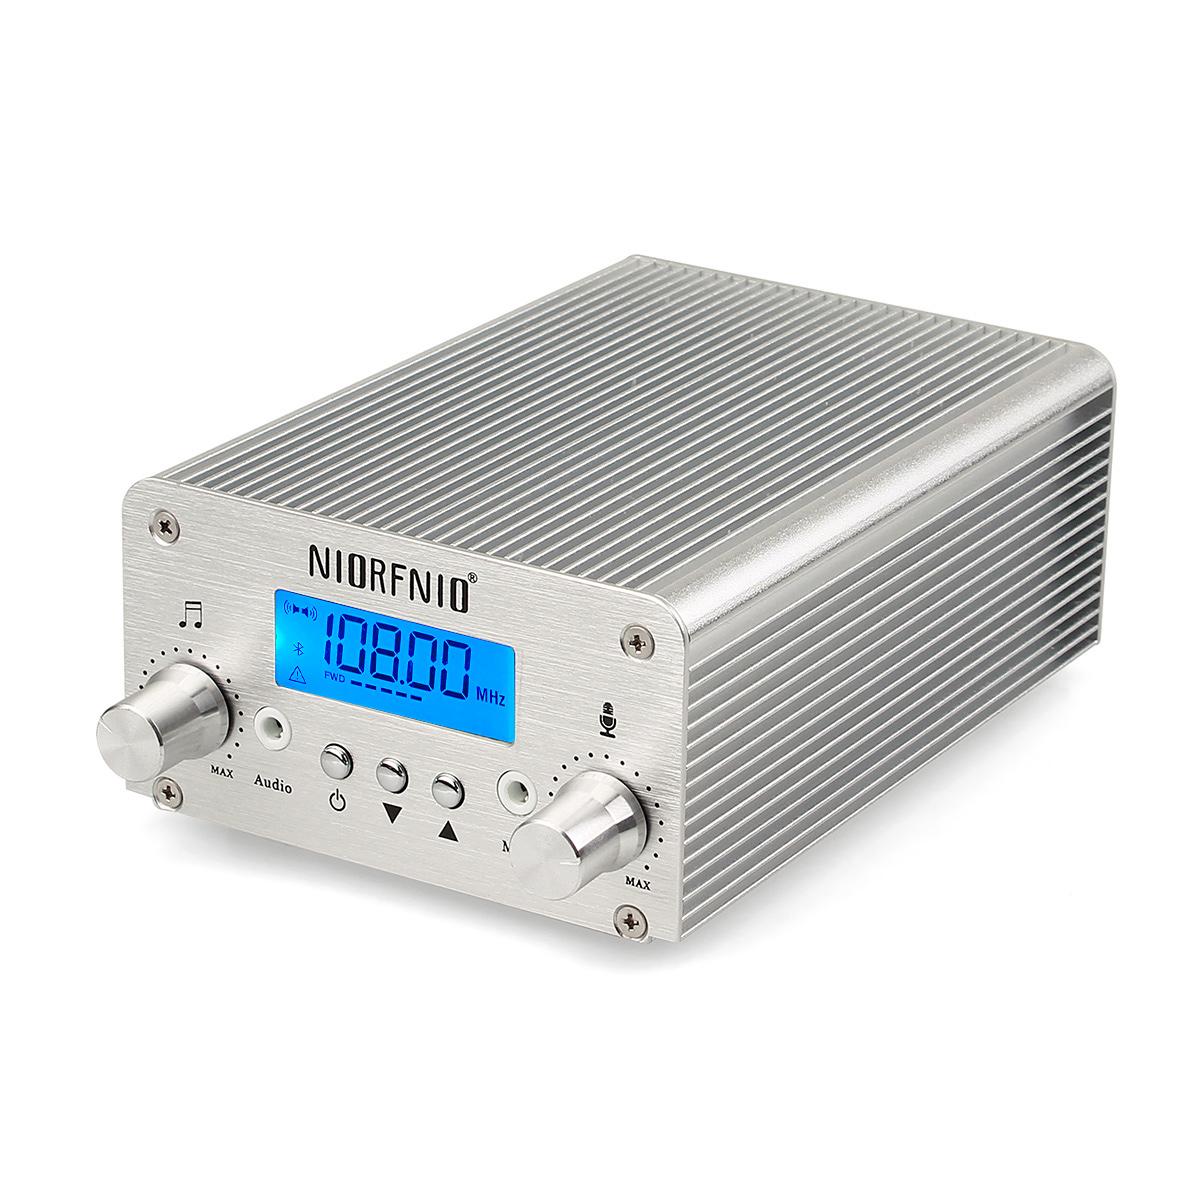 15w Pll Fm Transmitter Wireless Radio Stereo Station 87108mhz Circuit 88 108 Mhz 1w Mini Bluetooth Lossless Music Broadcast